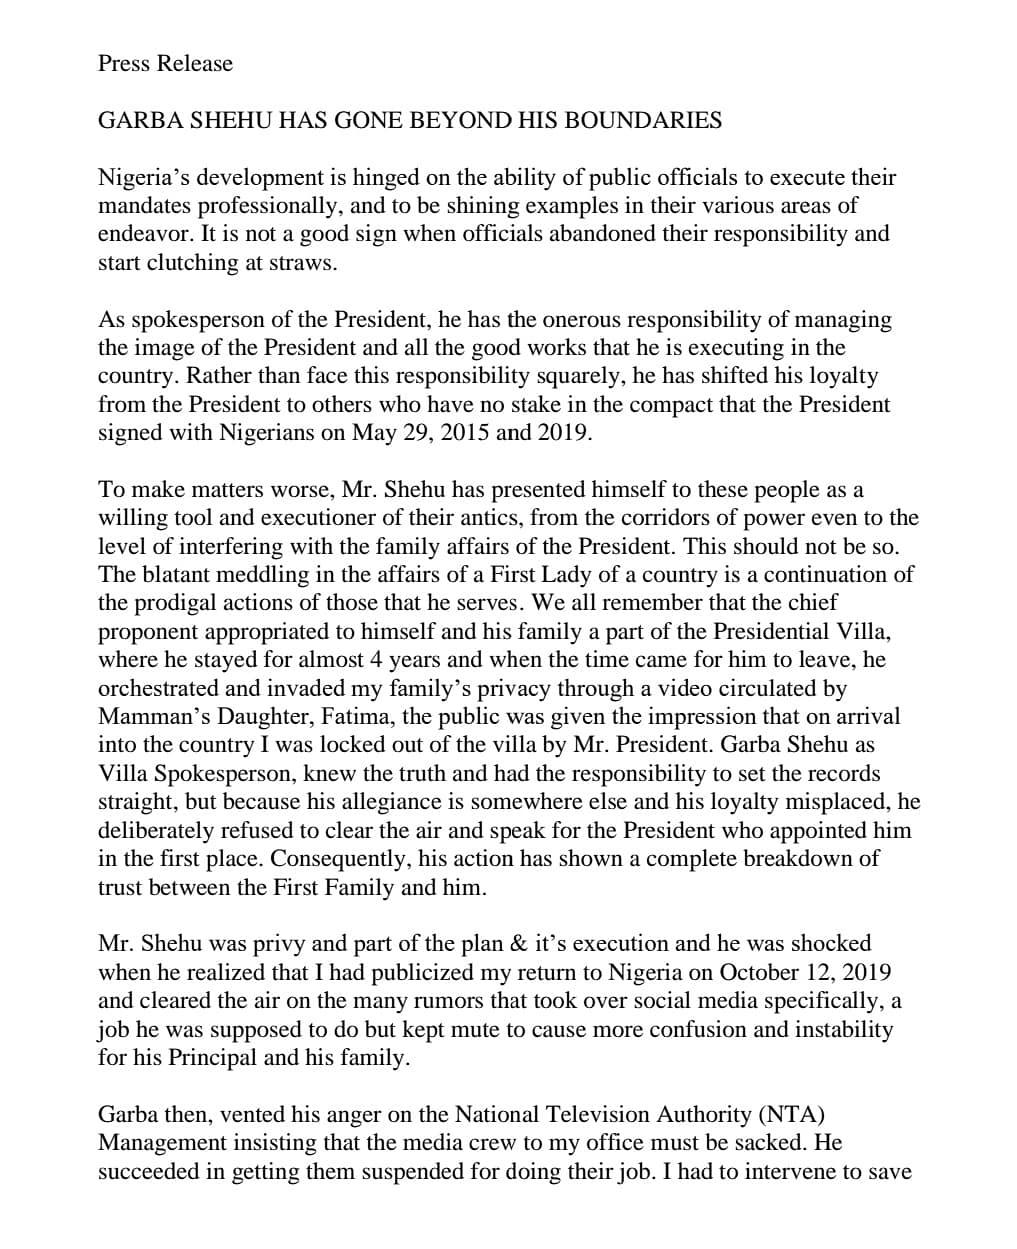 Aisha Buhari Attacks Garba Shehu, Says 'He Has Gone Beyond His Boundaries'